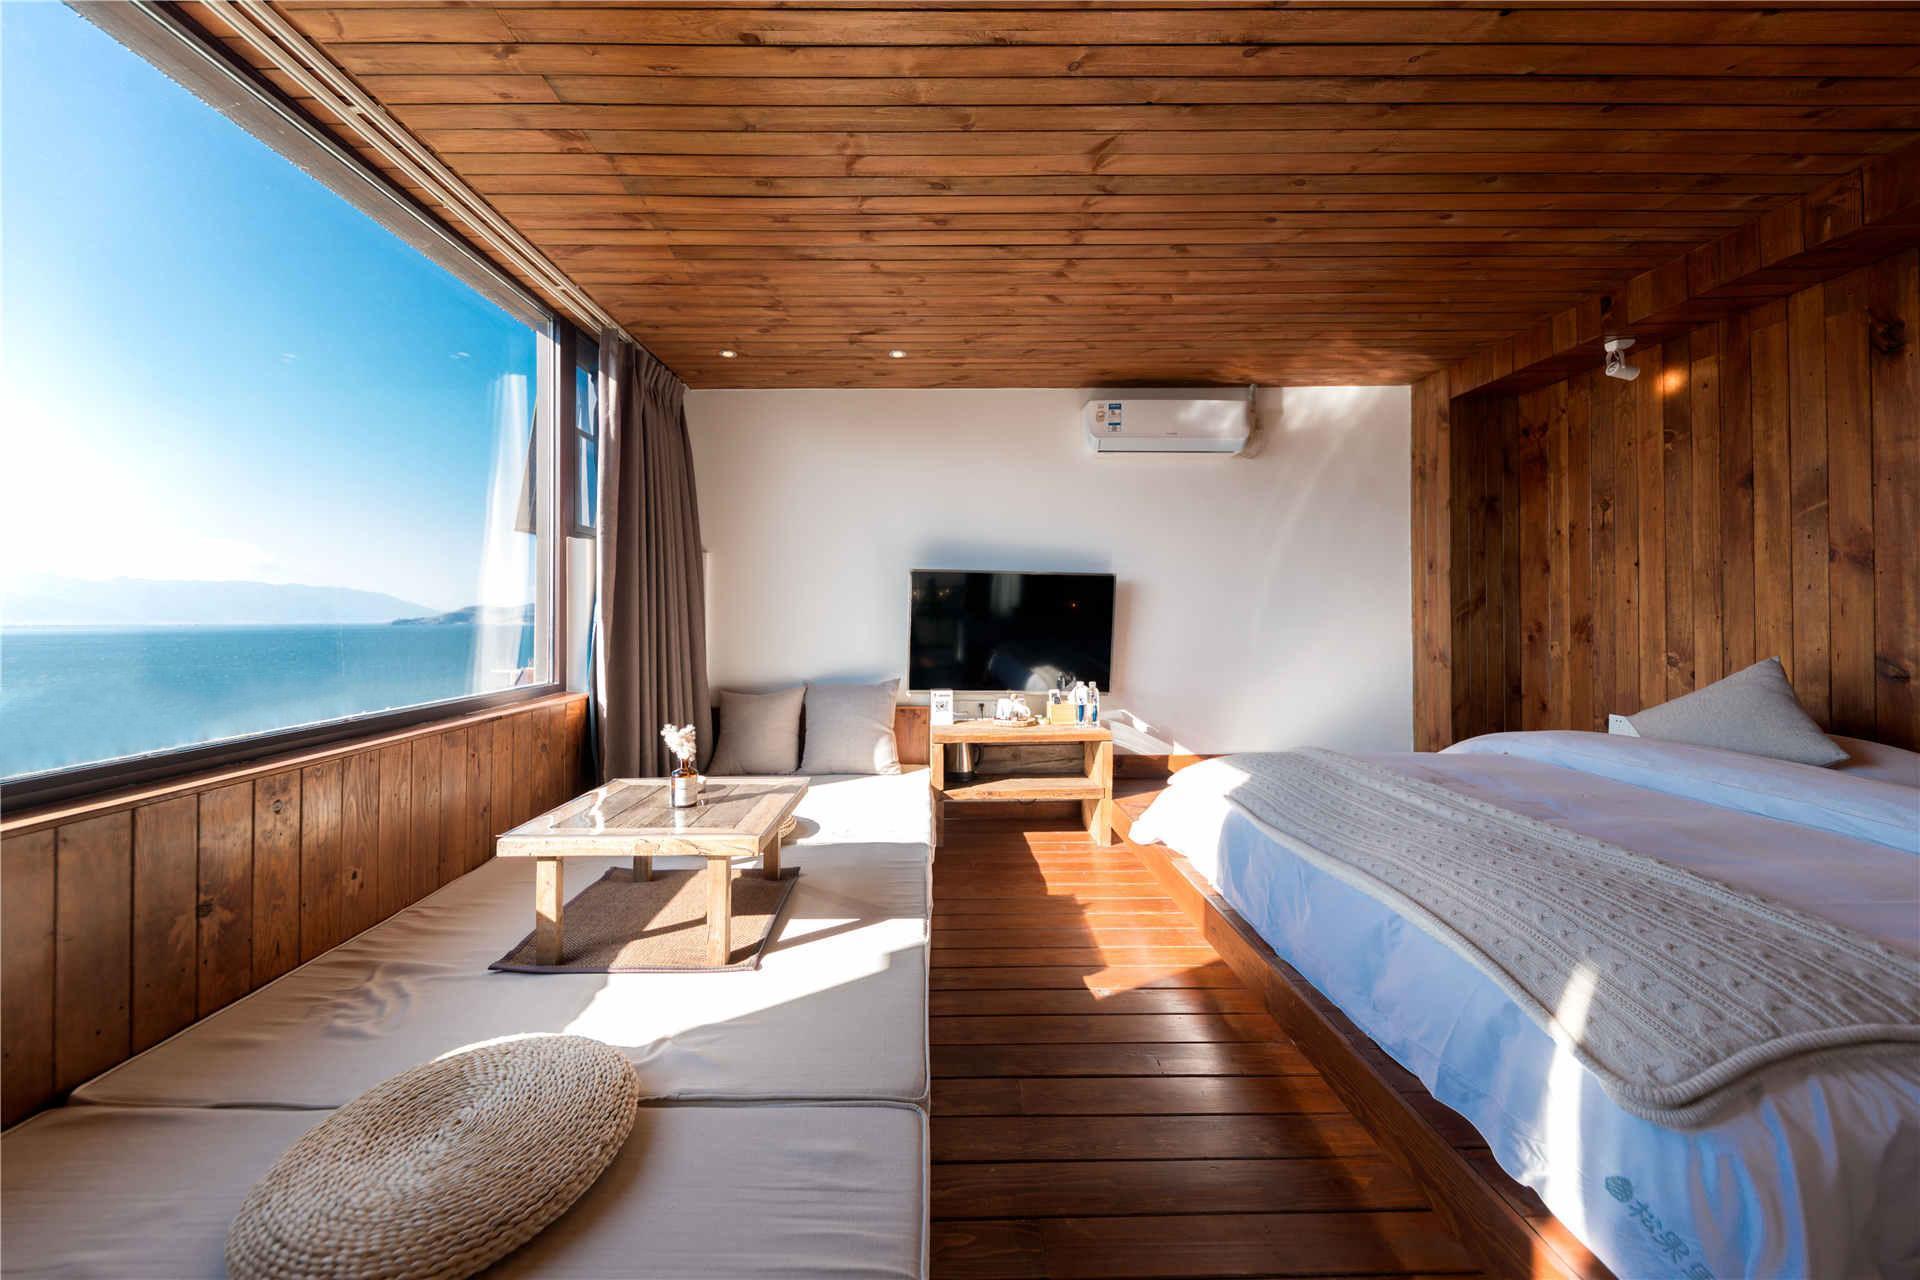 Reviews Songguoli-401- duplex ocean view suite